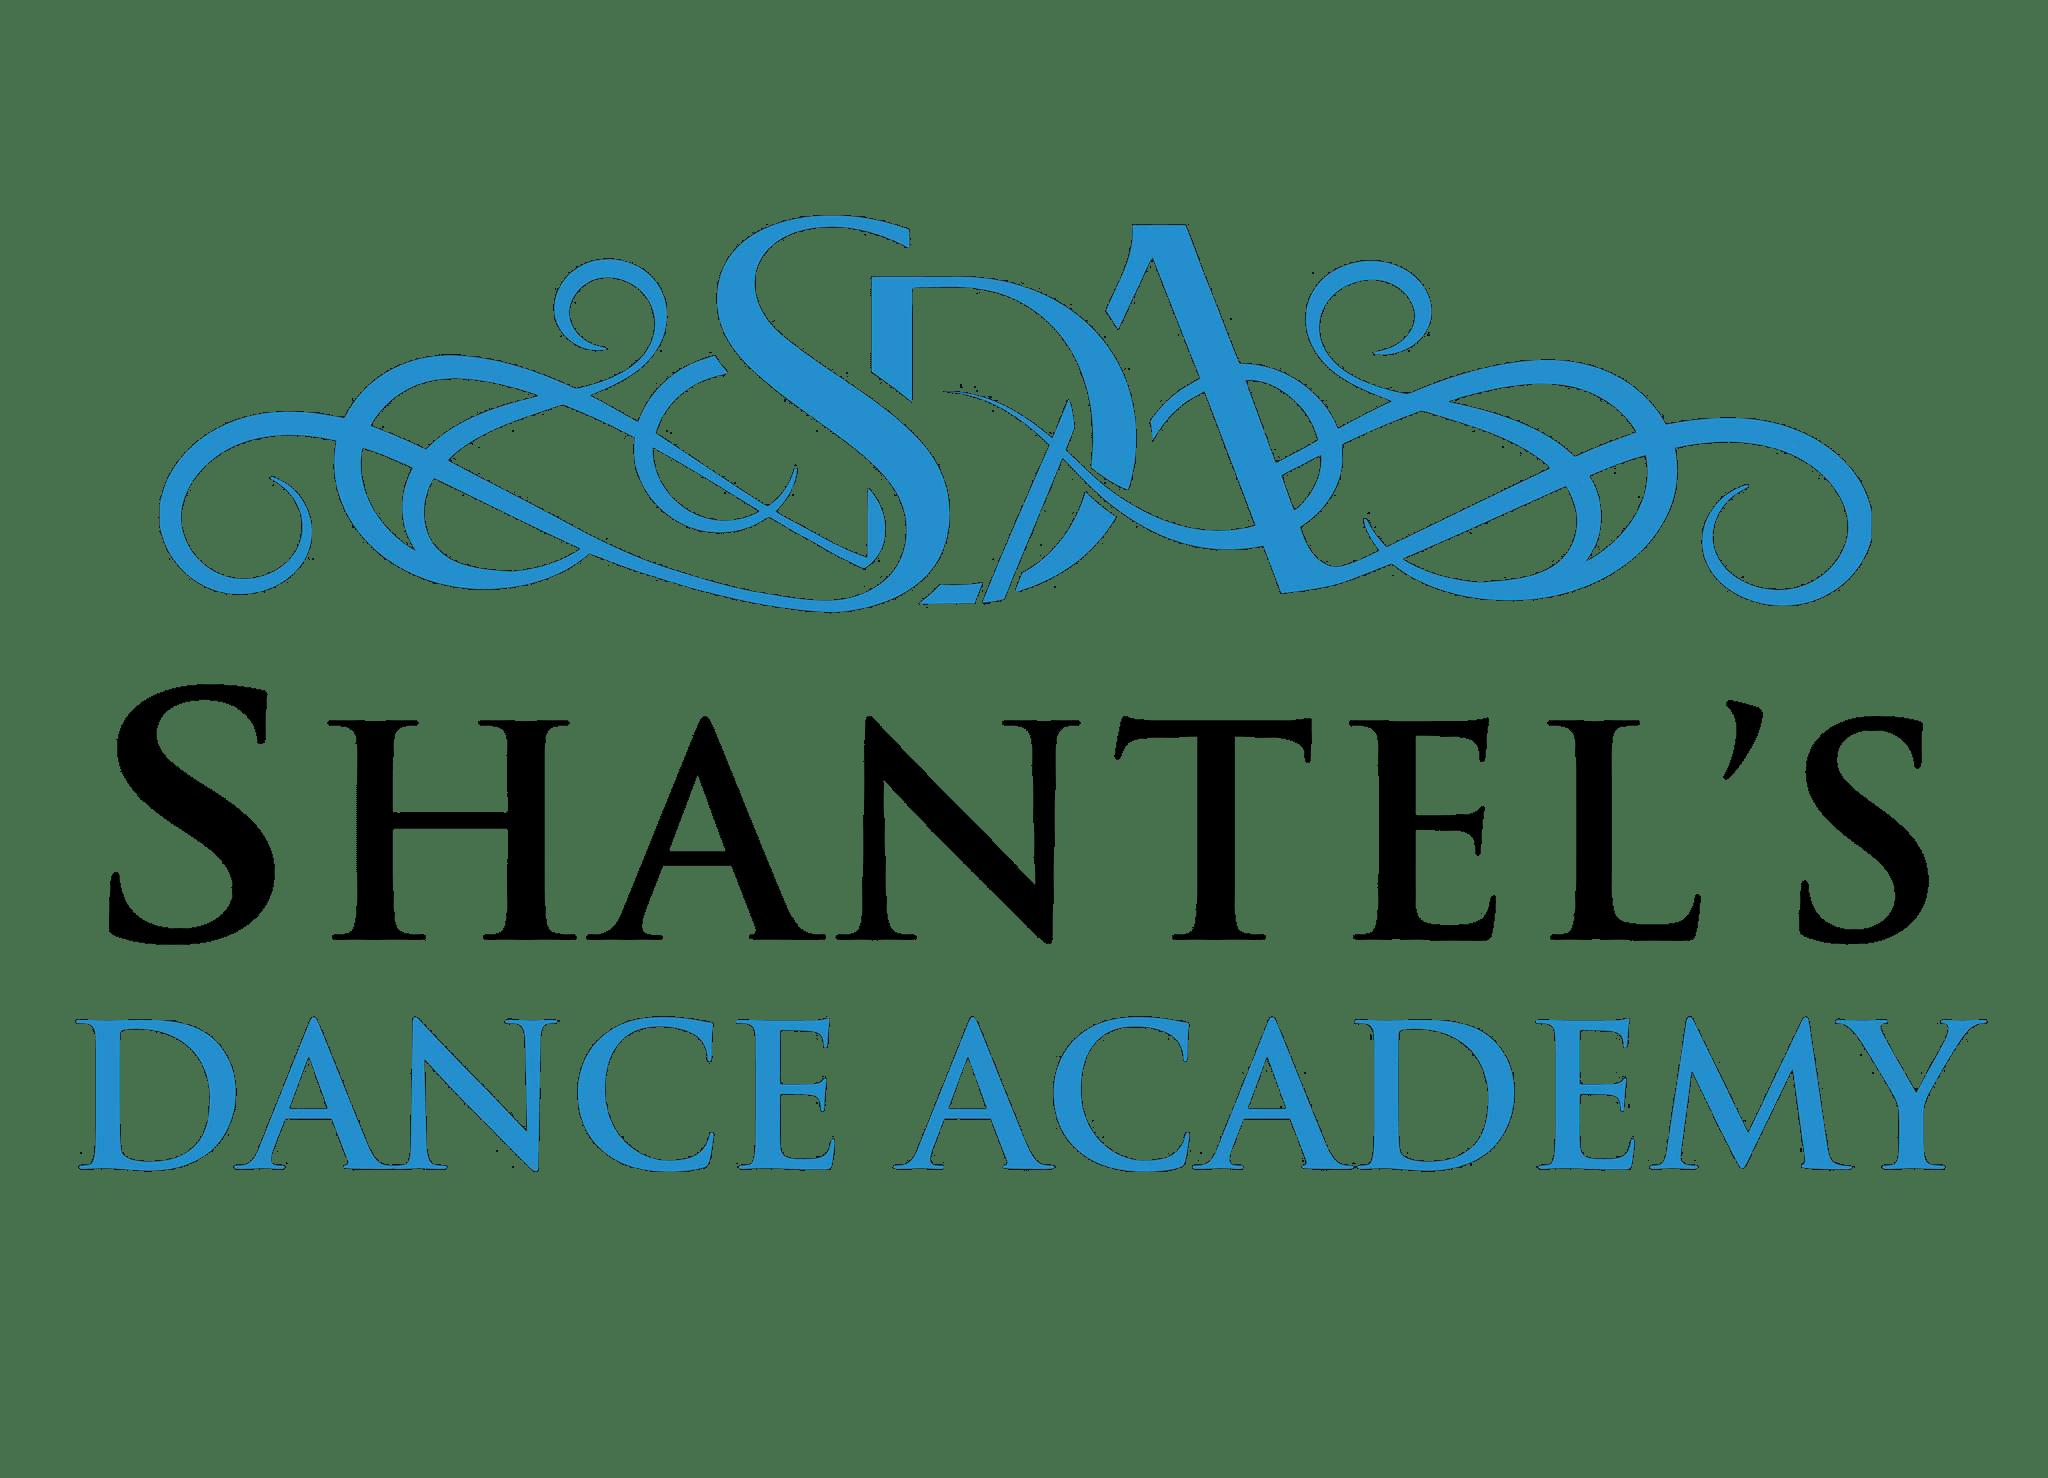 Shantel's Dance Academy